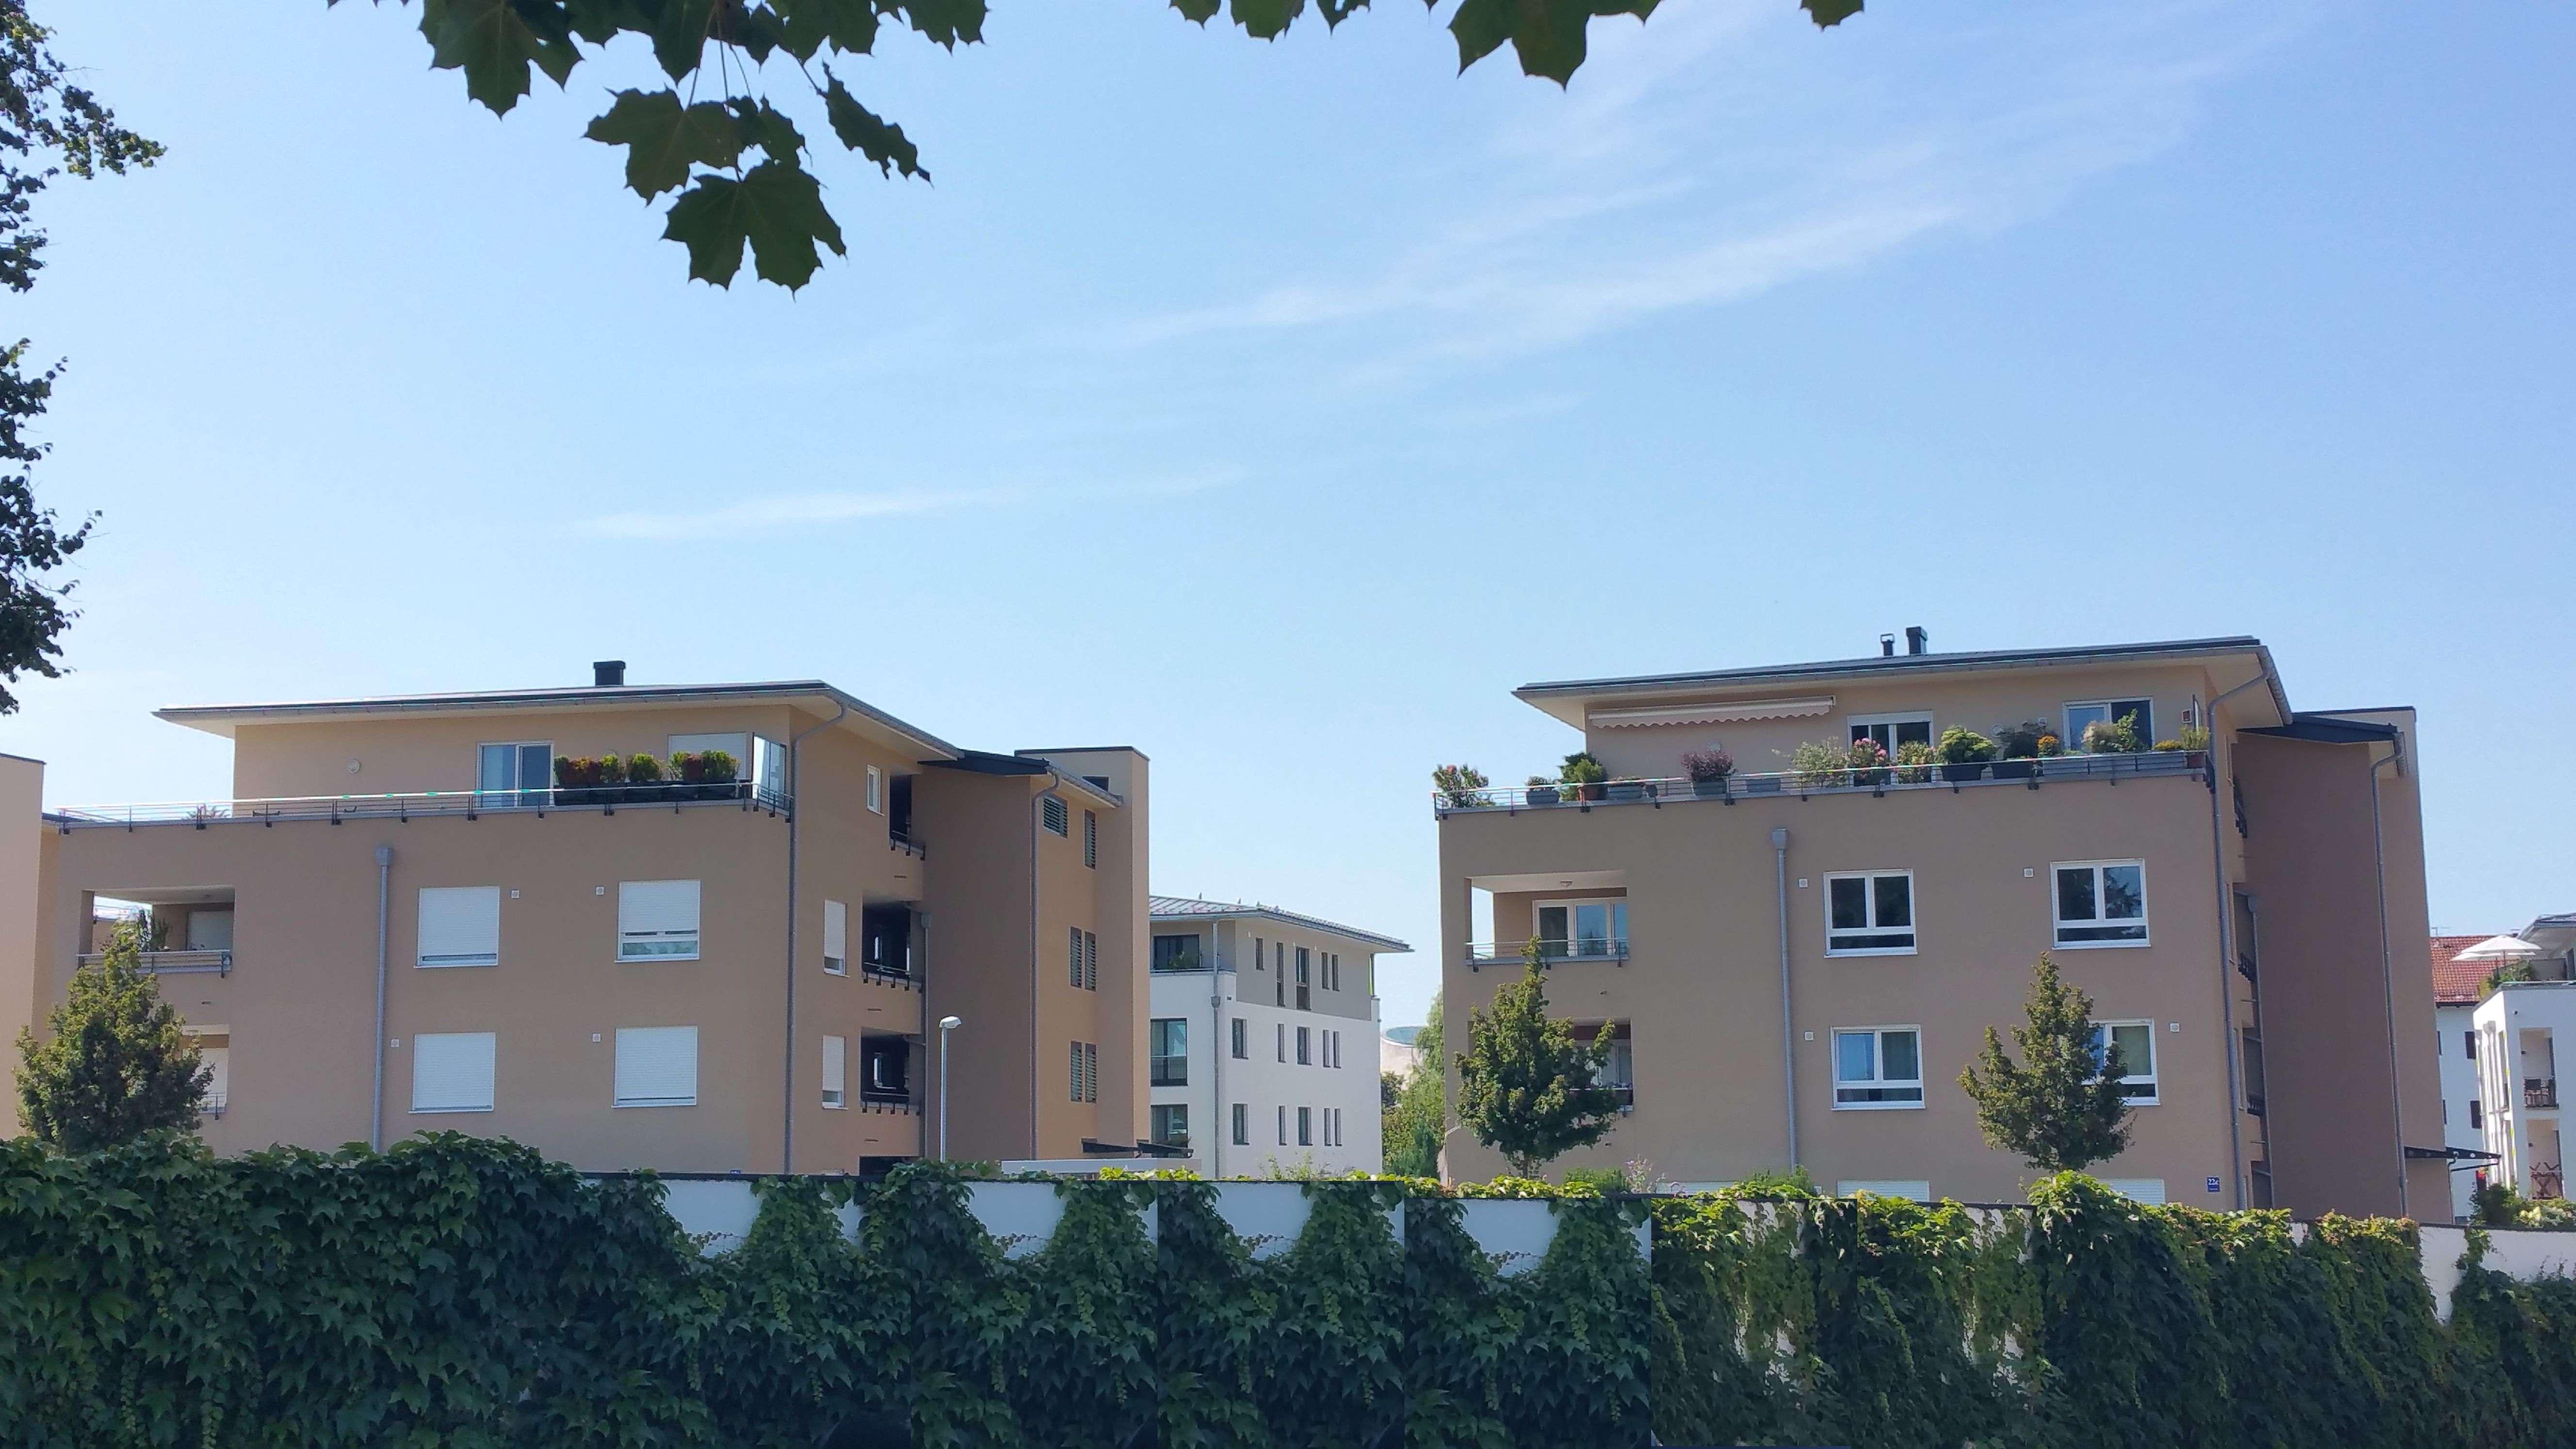 Holzkirchen-Zentrum : Moderne 2 ZKB, 1.OG, 72m², Lift, Süd/West-Balkon, EBK, TG, zum 15.01.2020 in Holzkirchen (Miesbach)